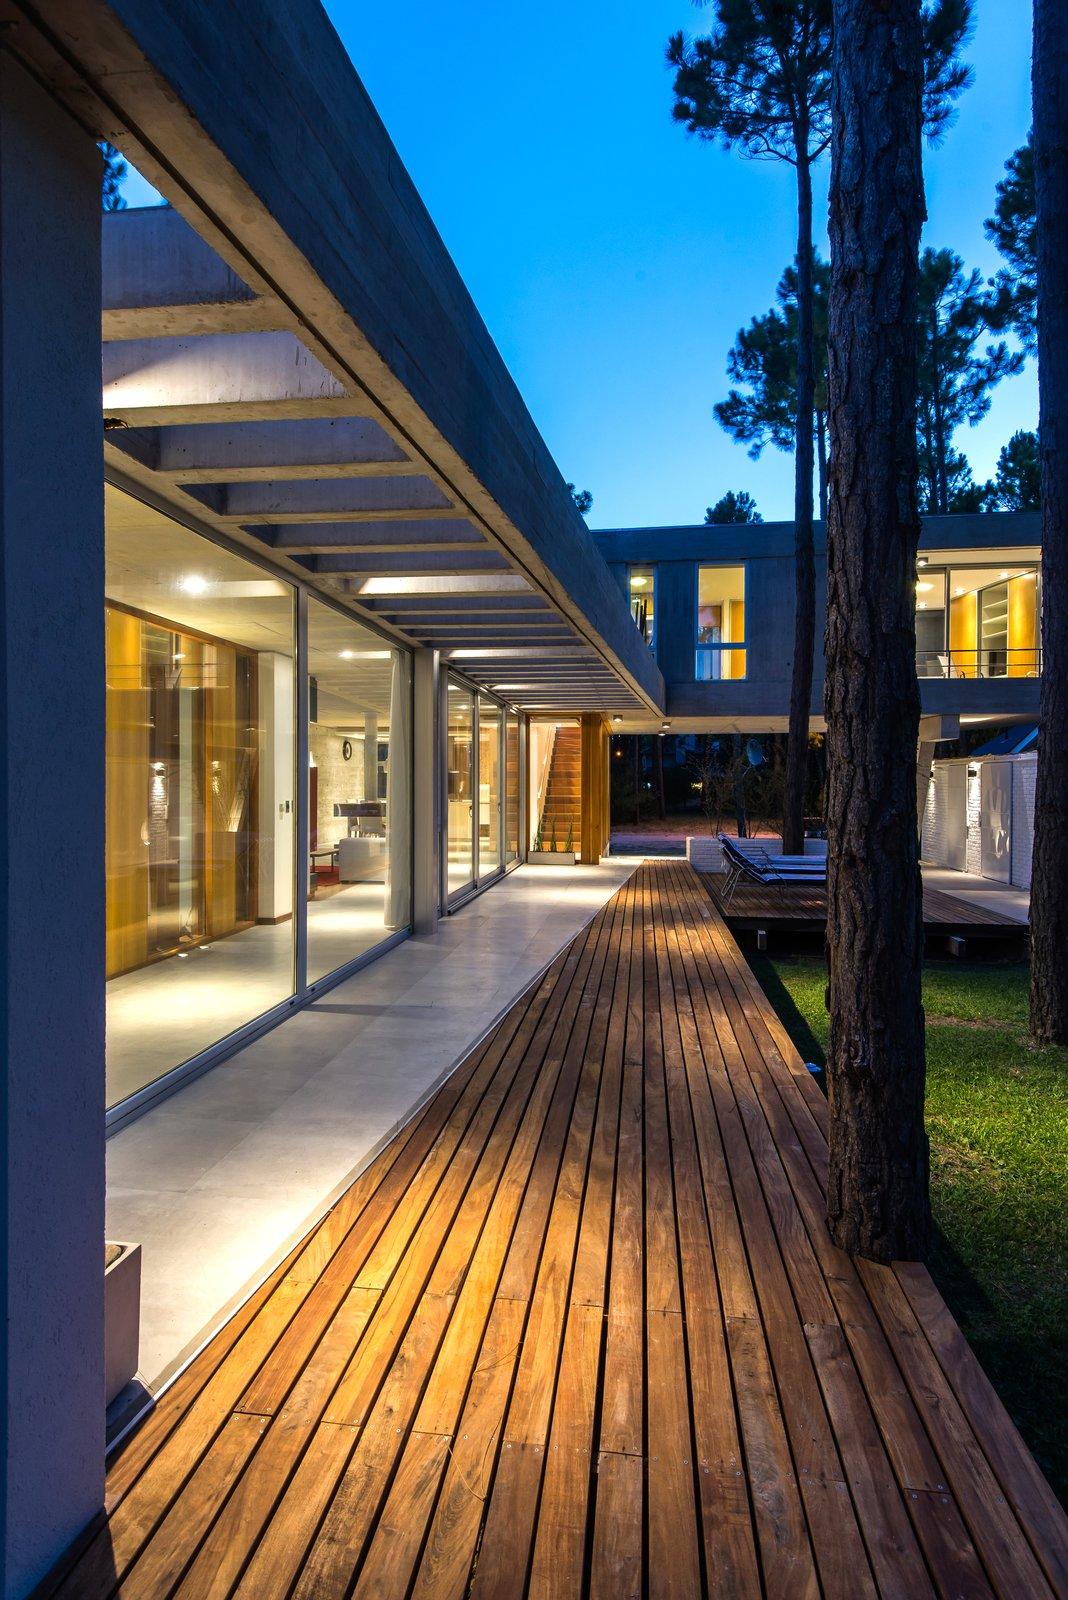 Tagged: Outdoor, Back Yard, Trees, Tile Patio, Porch, Deck, Decking Patio, Porch, Deck, and Wood Patio, Porch, Deck.  Casa Batin by Estudio Galera